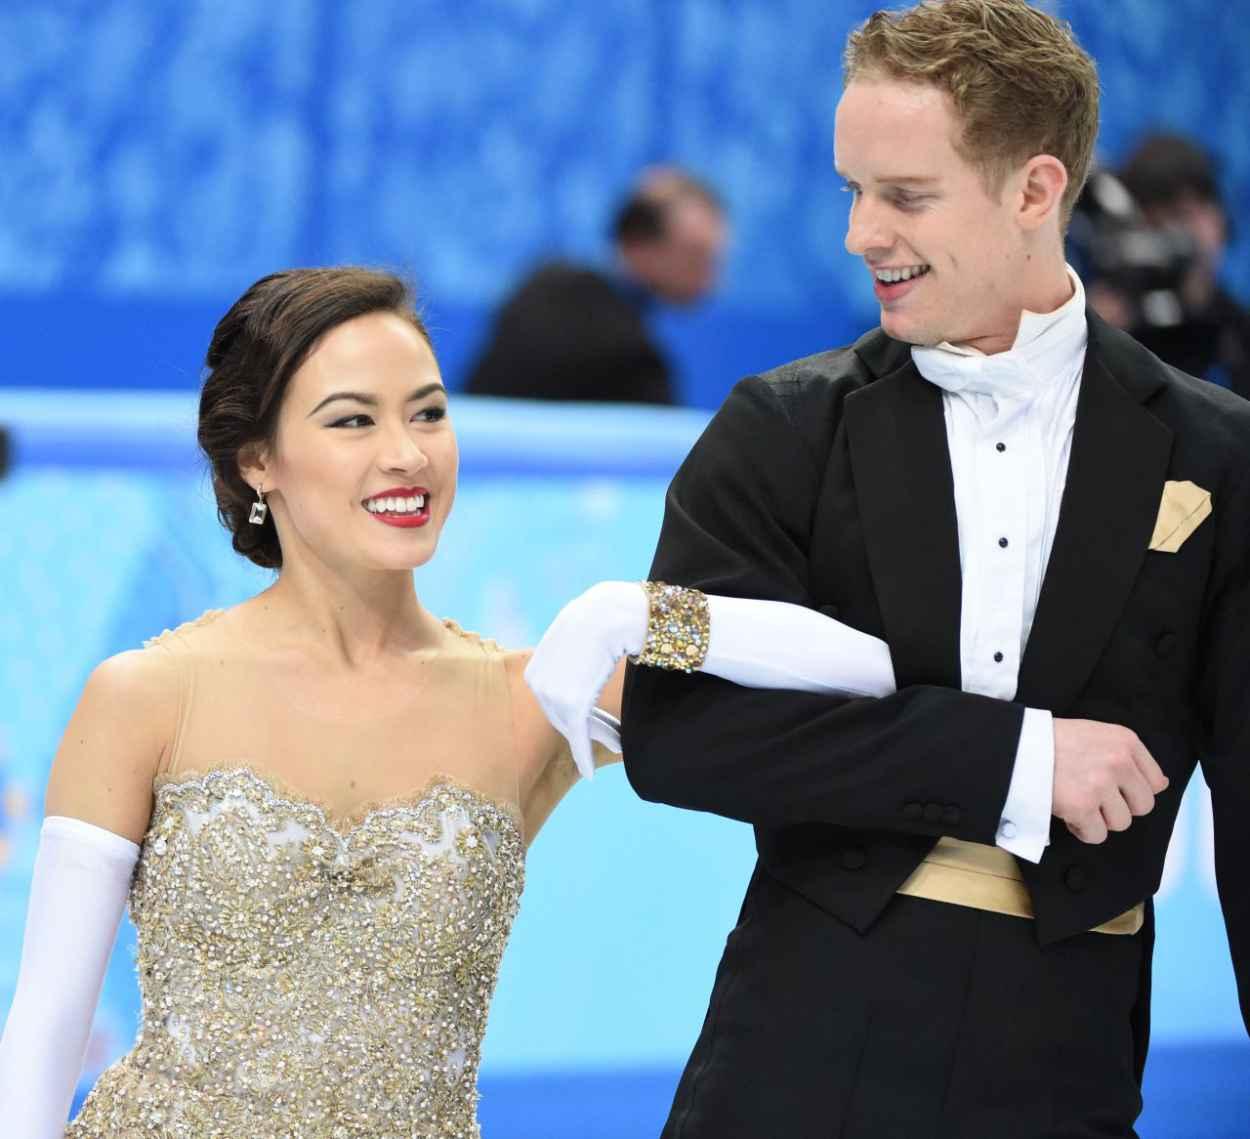 Madison Chock - 2015 Sochi Winter Olympics - Figure Skating Ice Dance-1